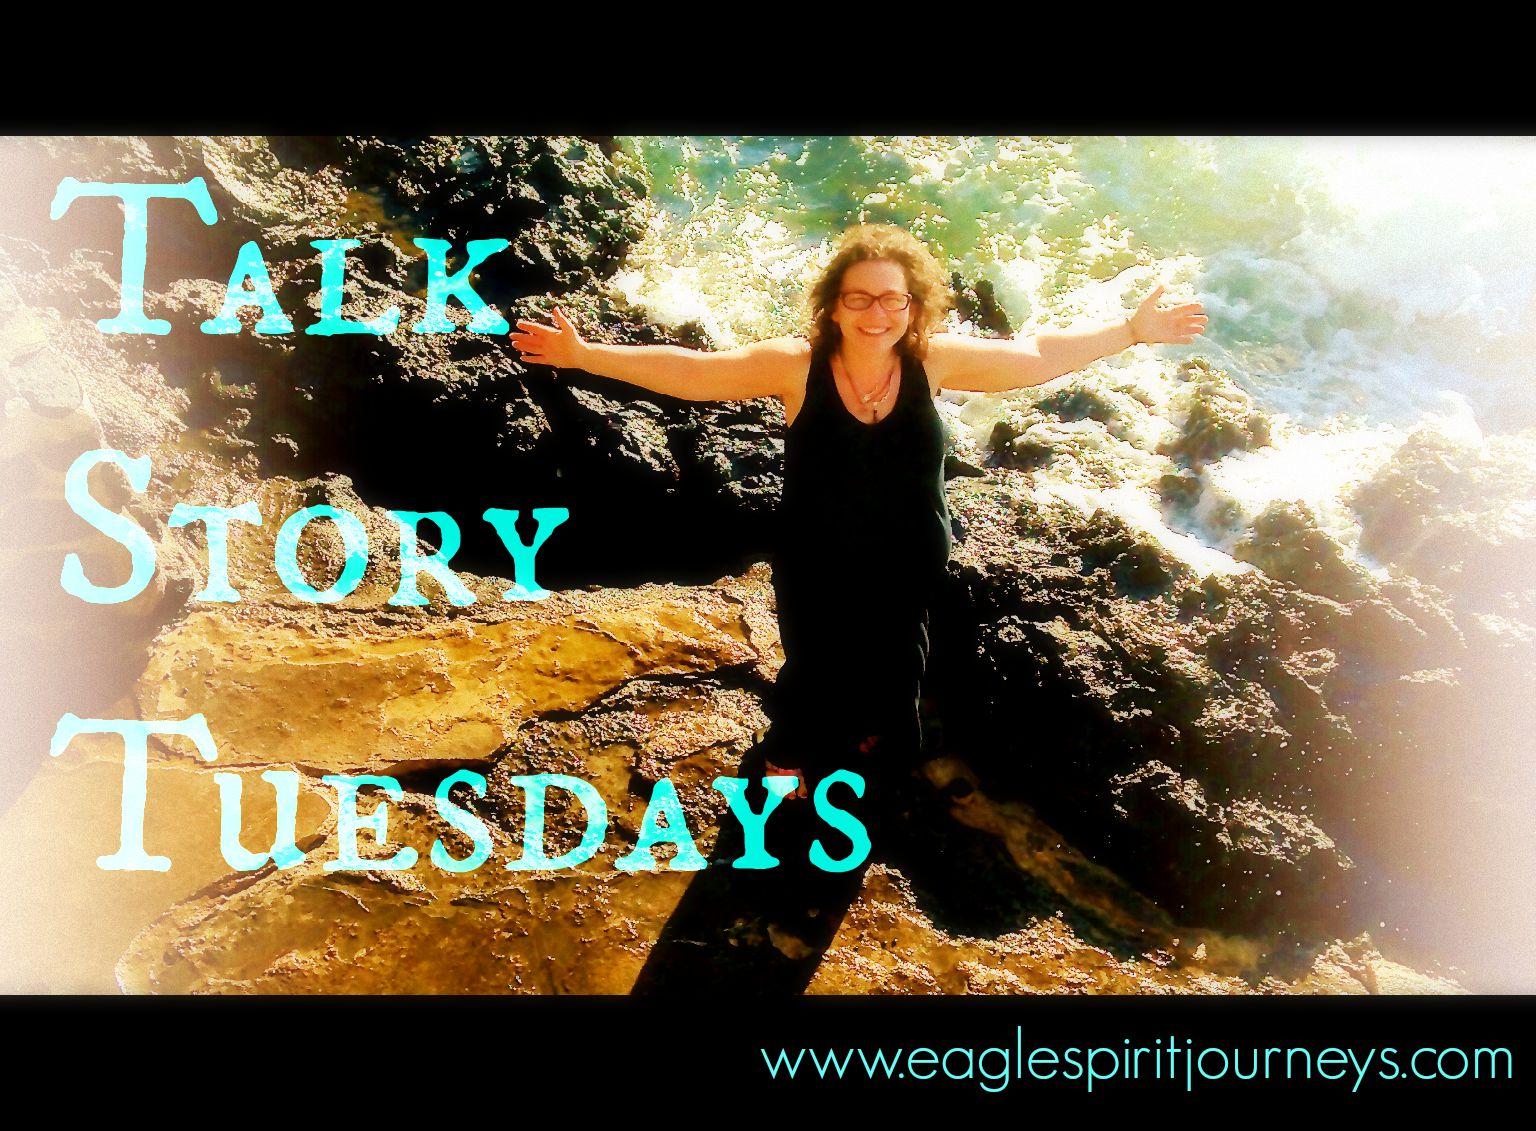 talk story Tuesdays